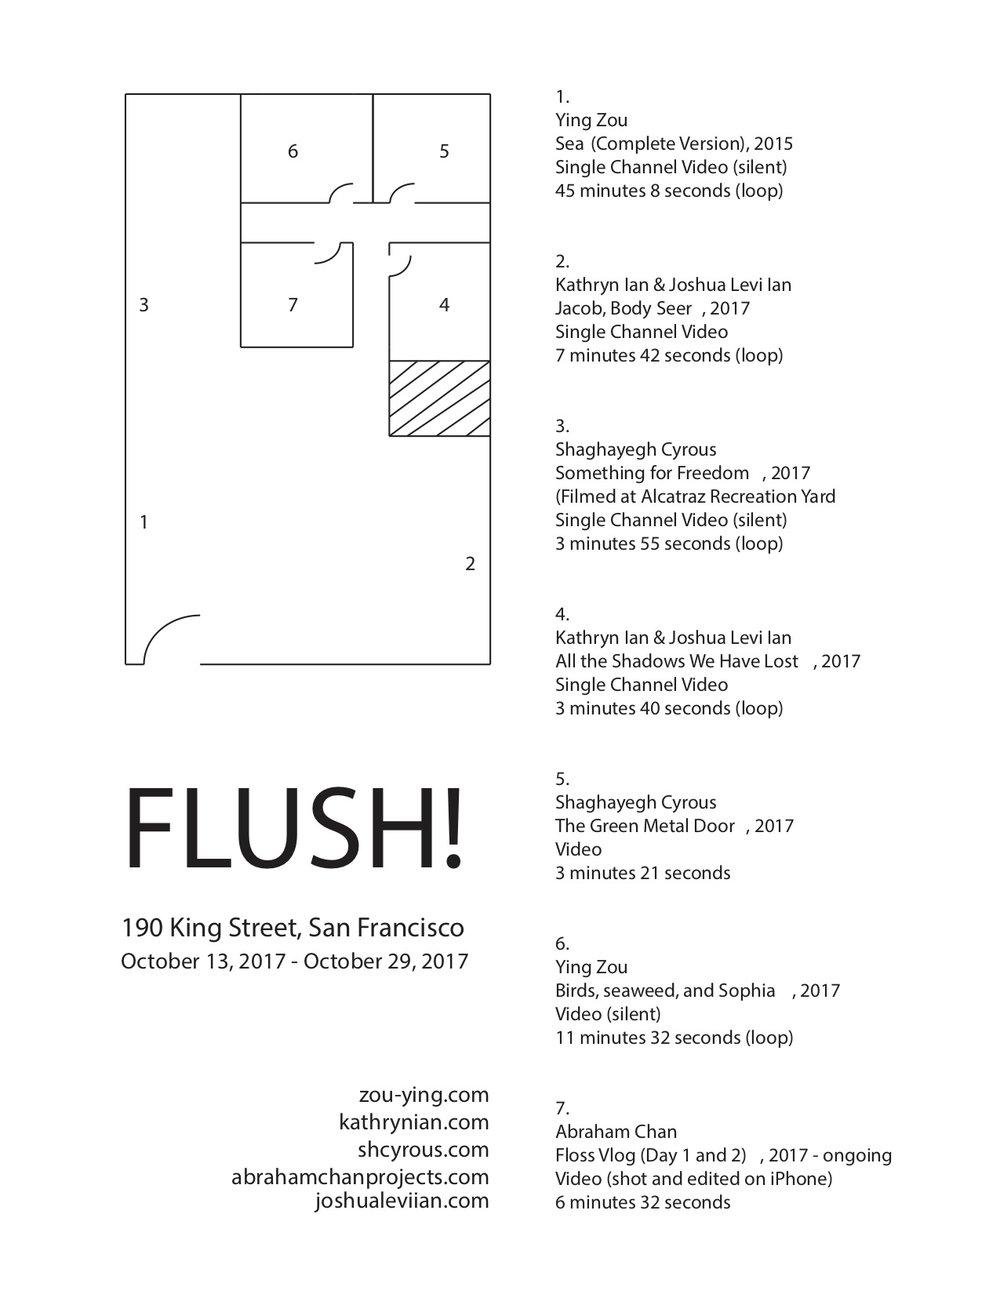 12_2 Flush exhibition sheet.jpg